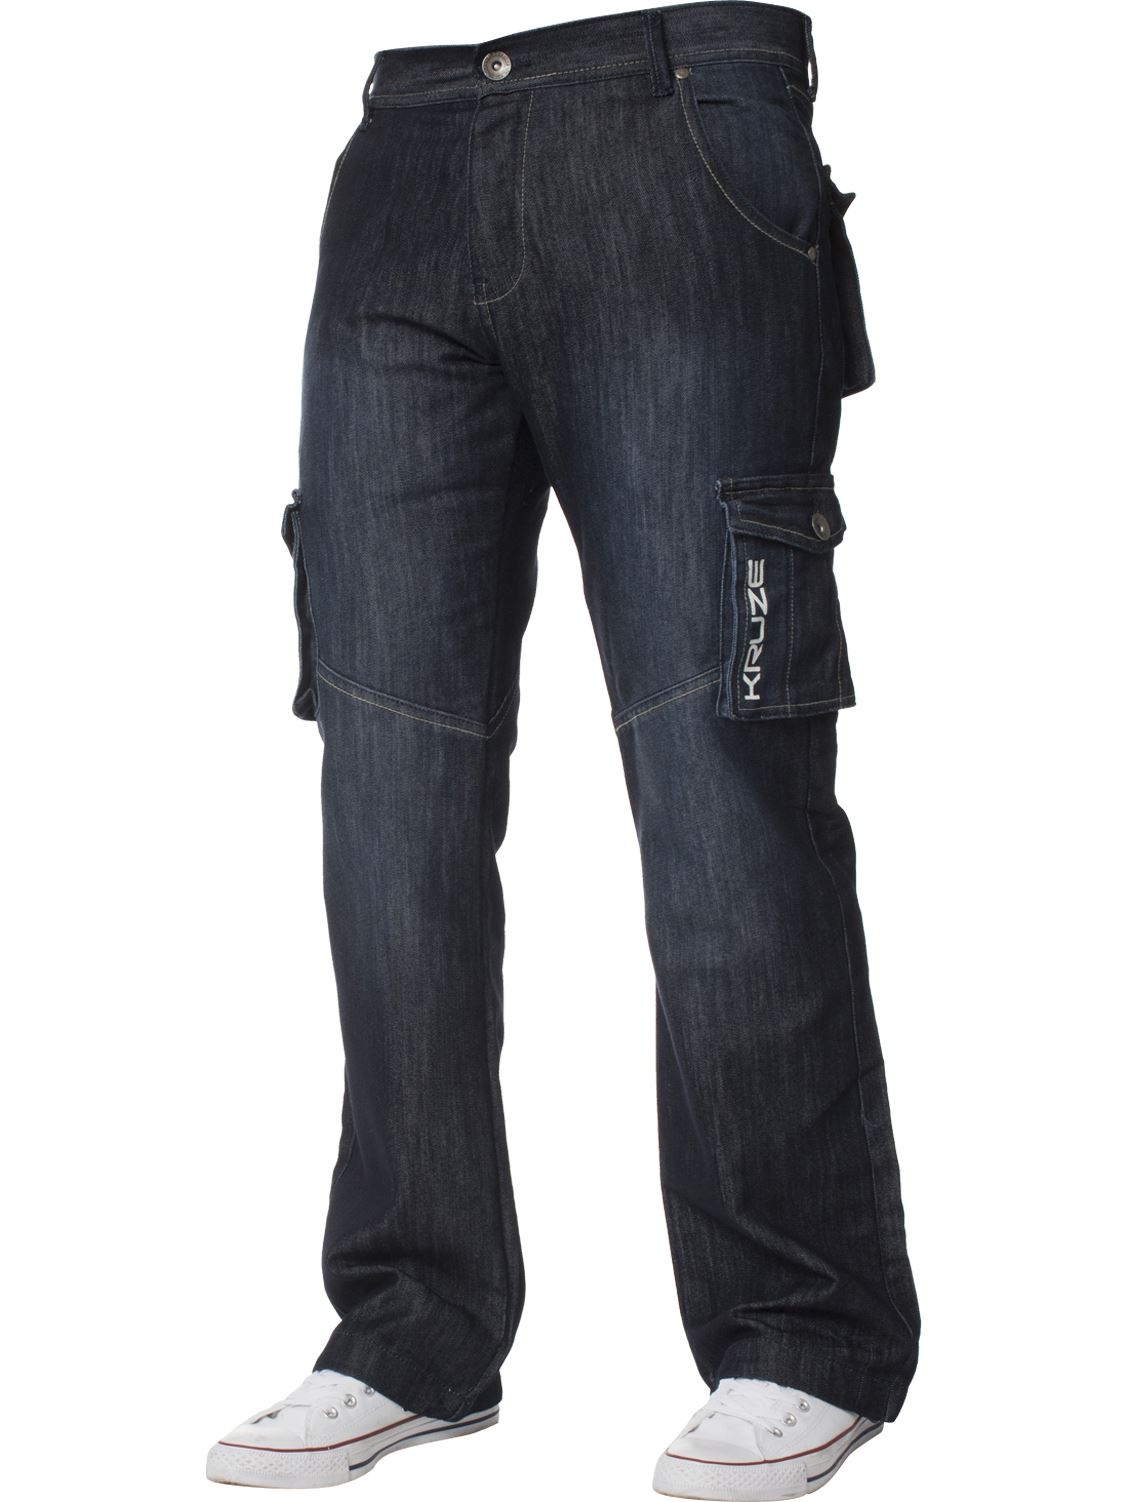 Grandes-jeans-para-hombre-de-combate-de-Kruze-Rey-Alto-Pierna-Cargo-Pantalones-Jeans-Pantalones miniatura 14